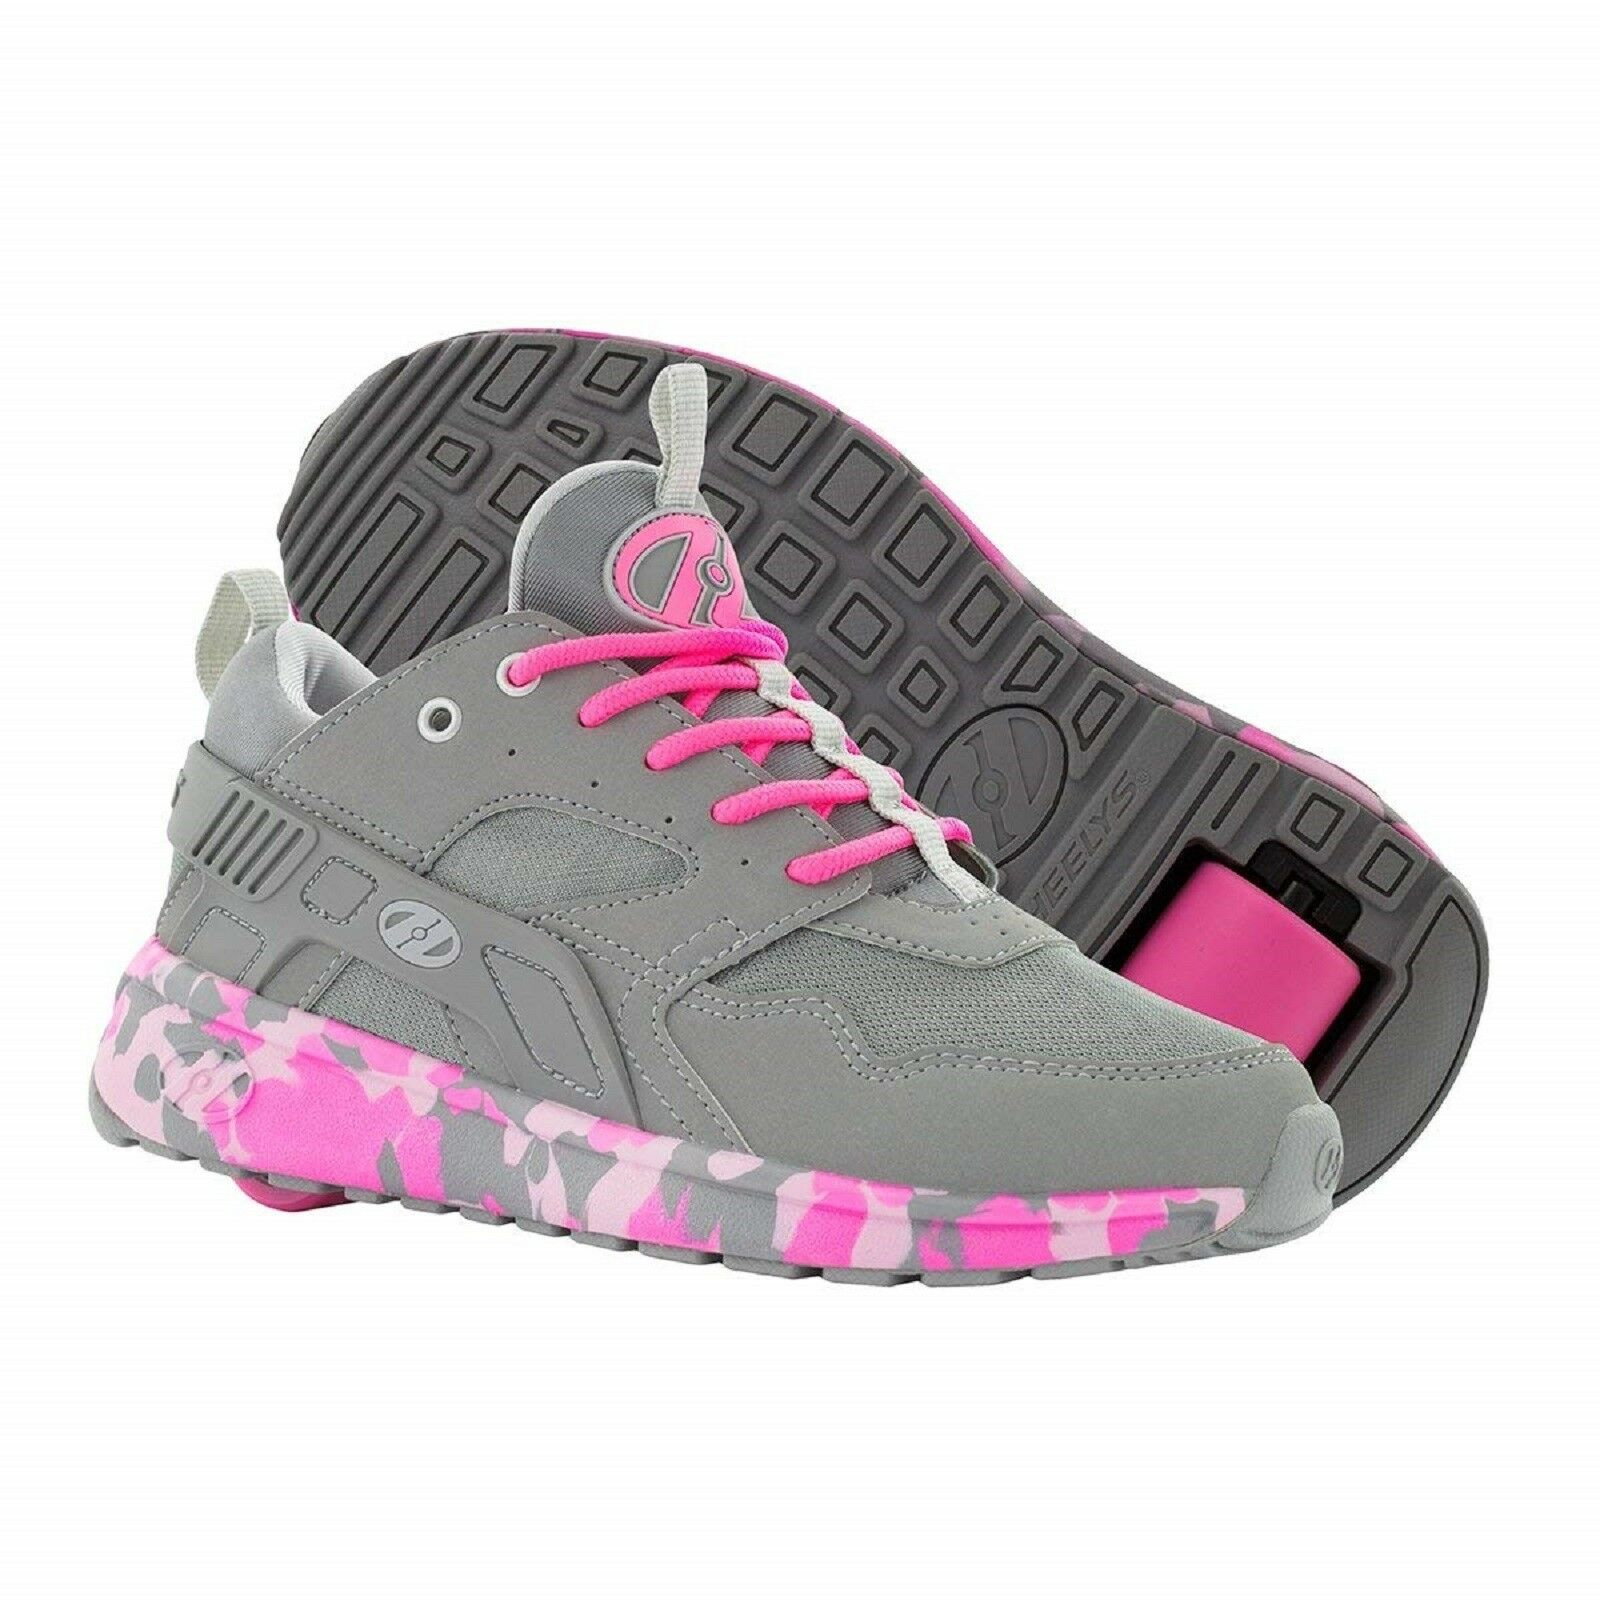 HEELYS FORCE grau/Rosa KIDS ROLLER SKATE Schuhe FORCE K Turnschuhe grau/Rosa FORCE CONFETTI HE100098 0ffec3